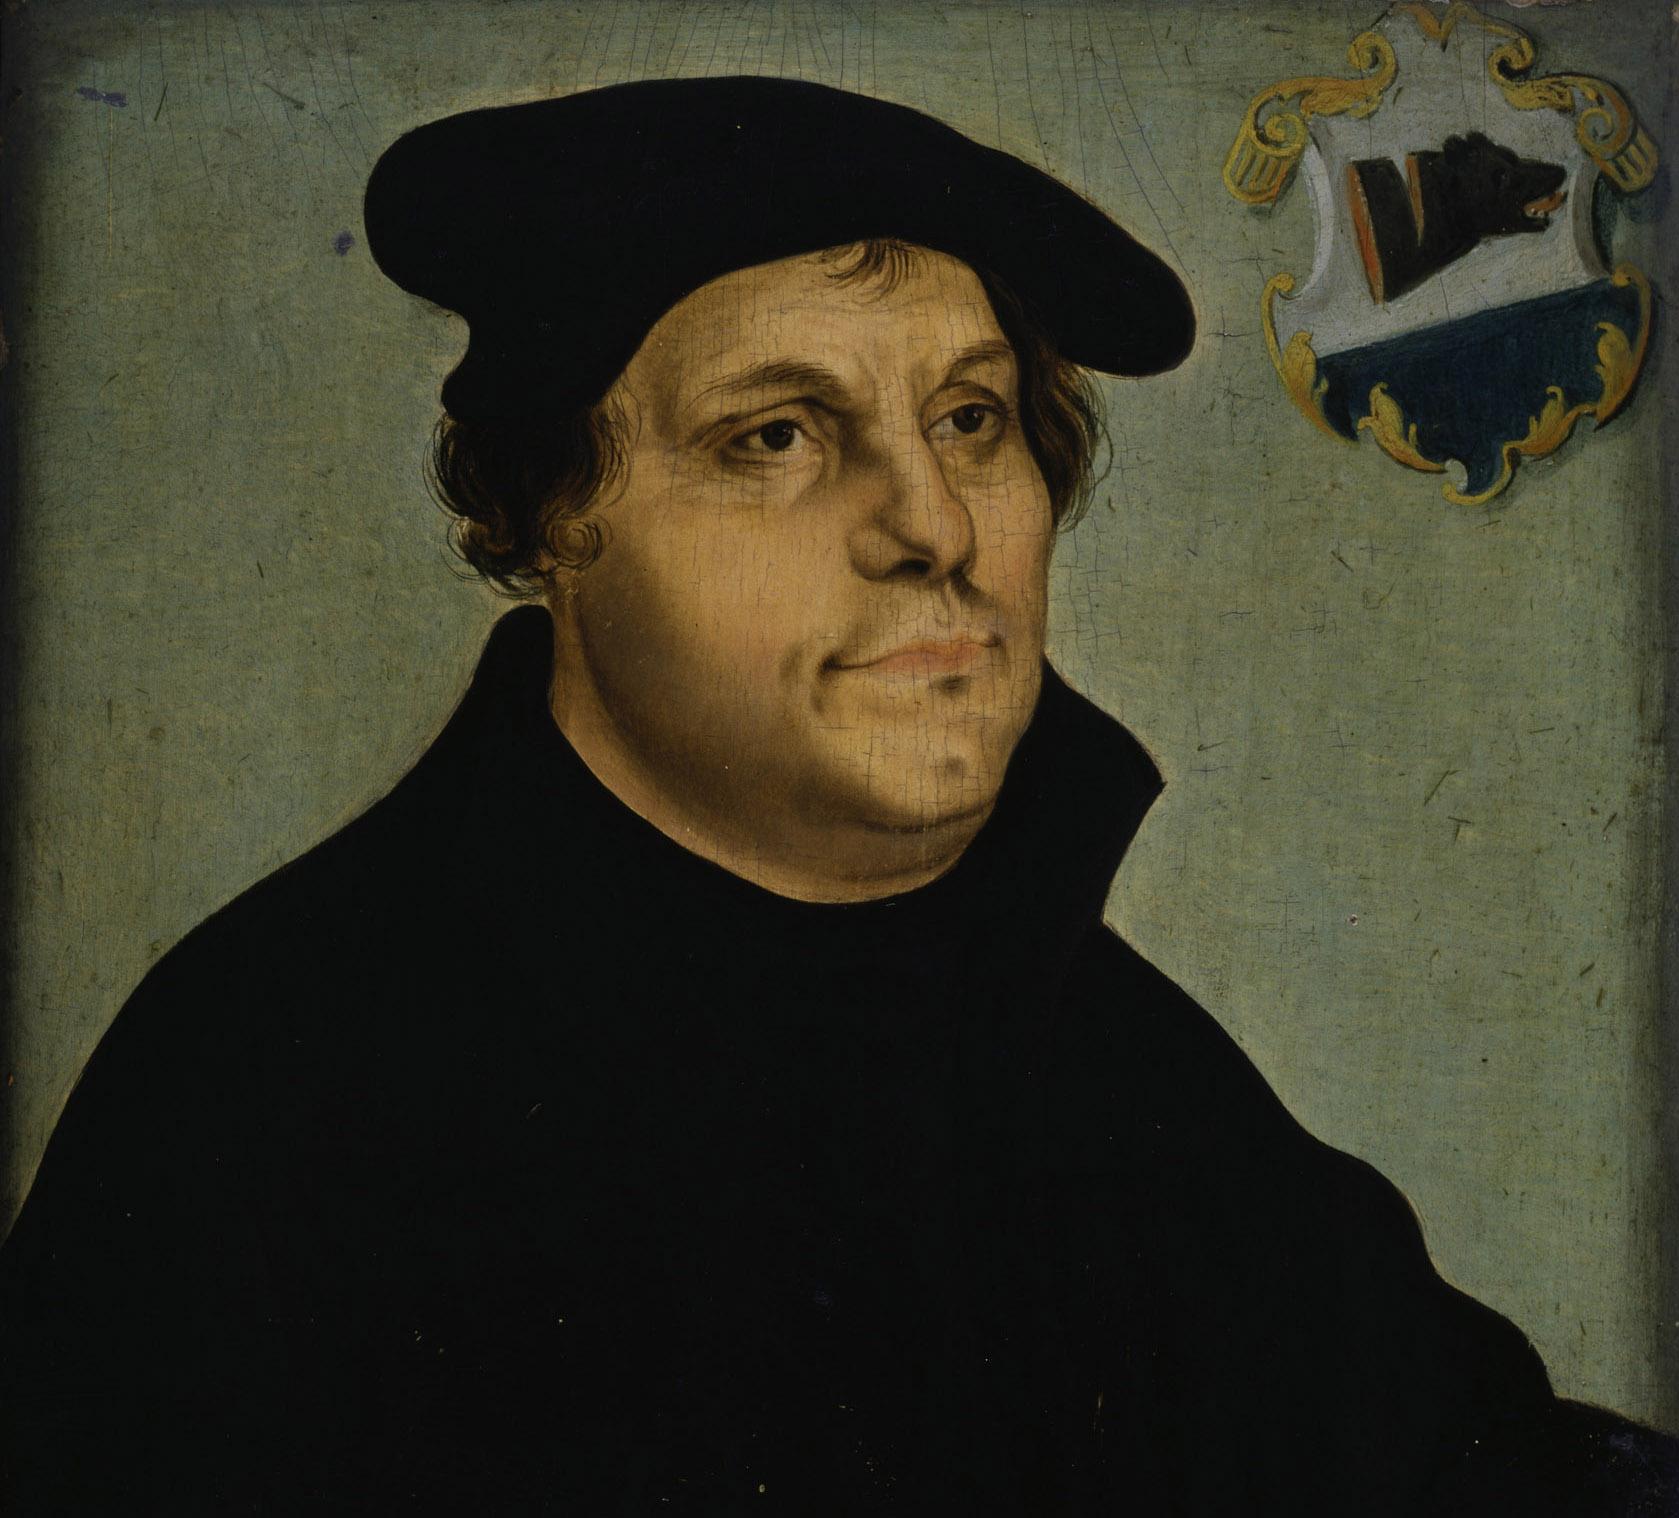 Lucas Cranach d. Ä. (1472 - 1553): Martin Luther © Hamburger Kunsthalle / bpk, Foto: Elke Walford